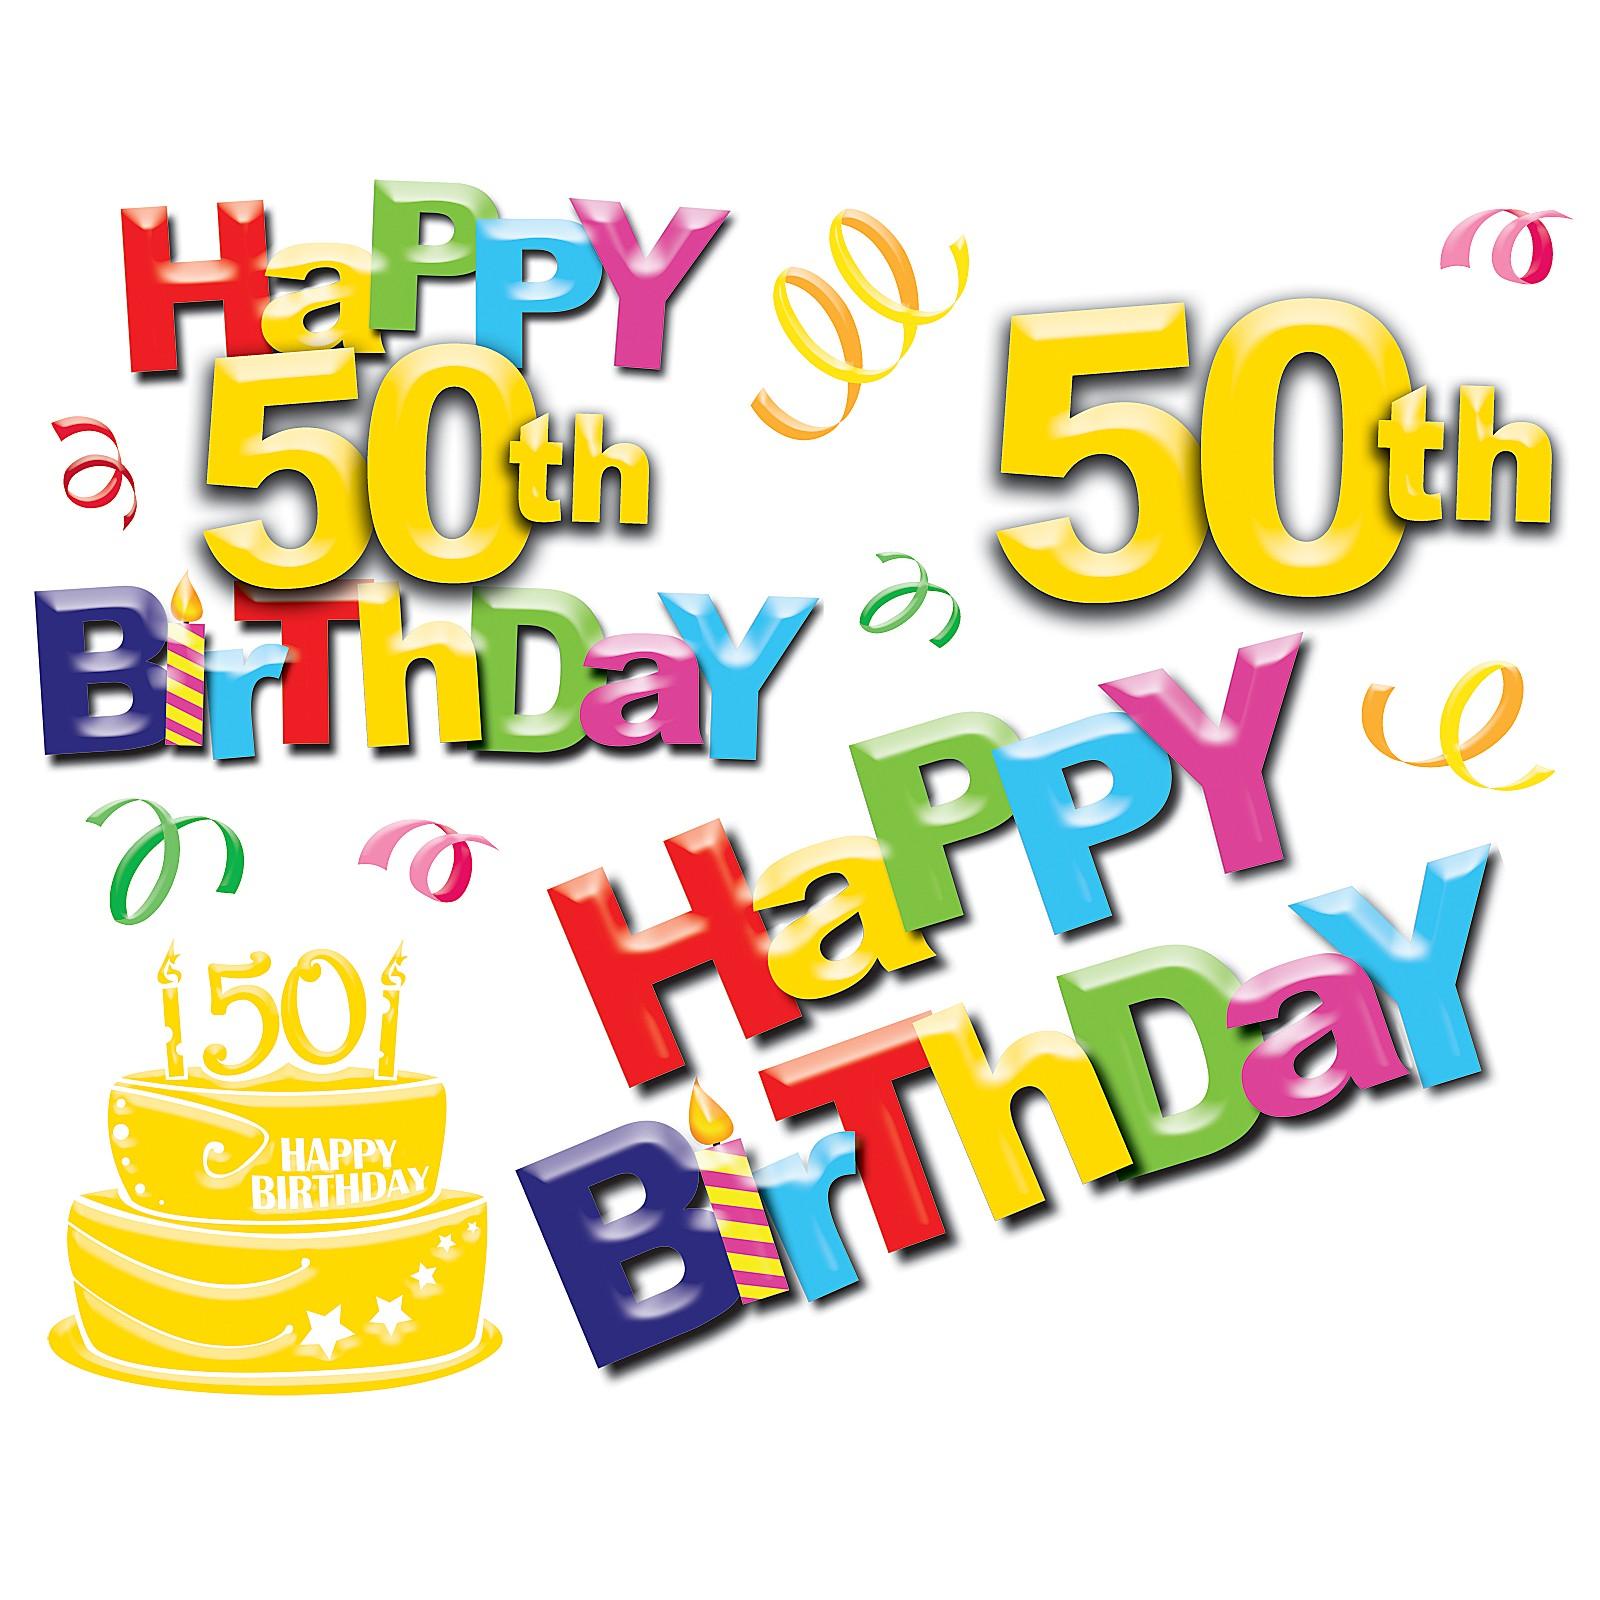 Happy Birthday Clipart | Free download best Happy Birthday